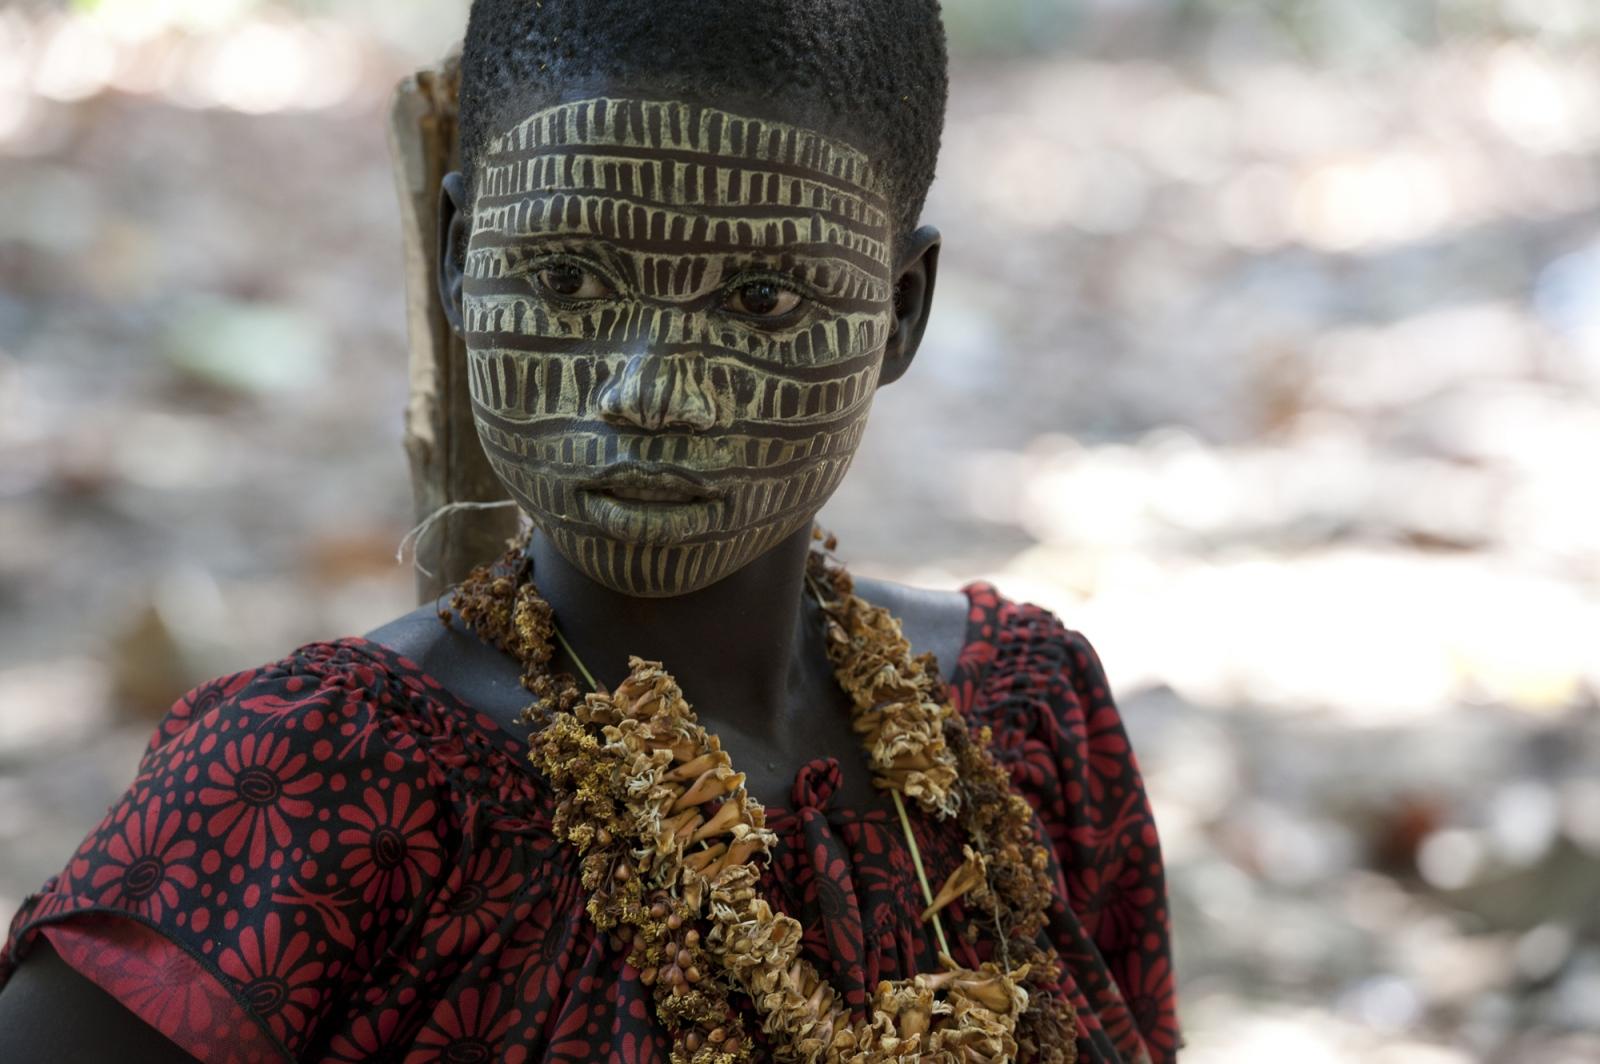 Art and Documentary Photography - Loading jarawa_beilvert_etalay_and_her_make-up.jpg